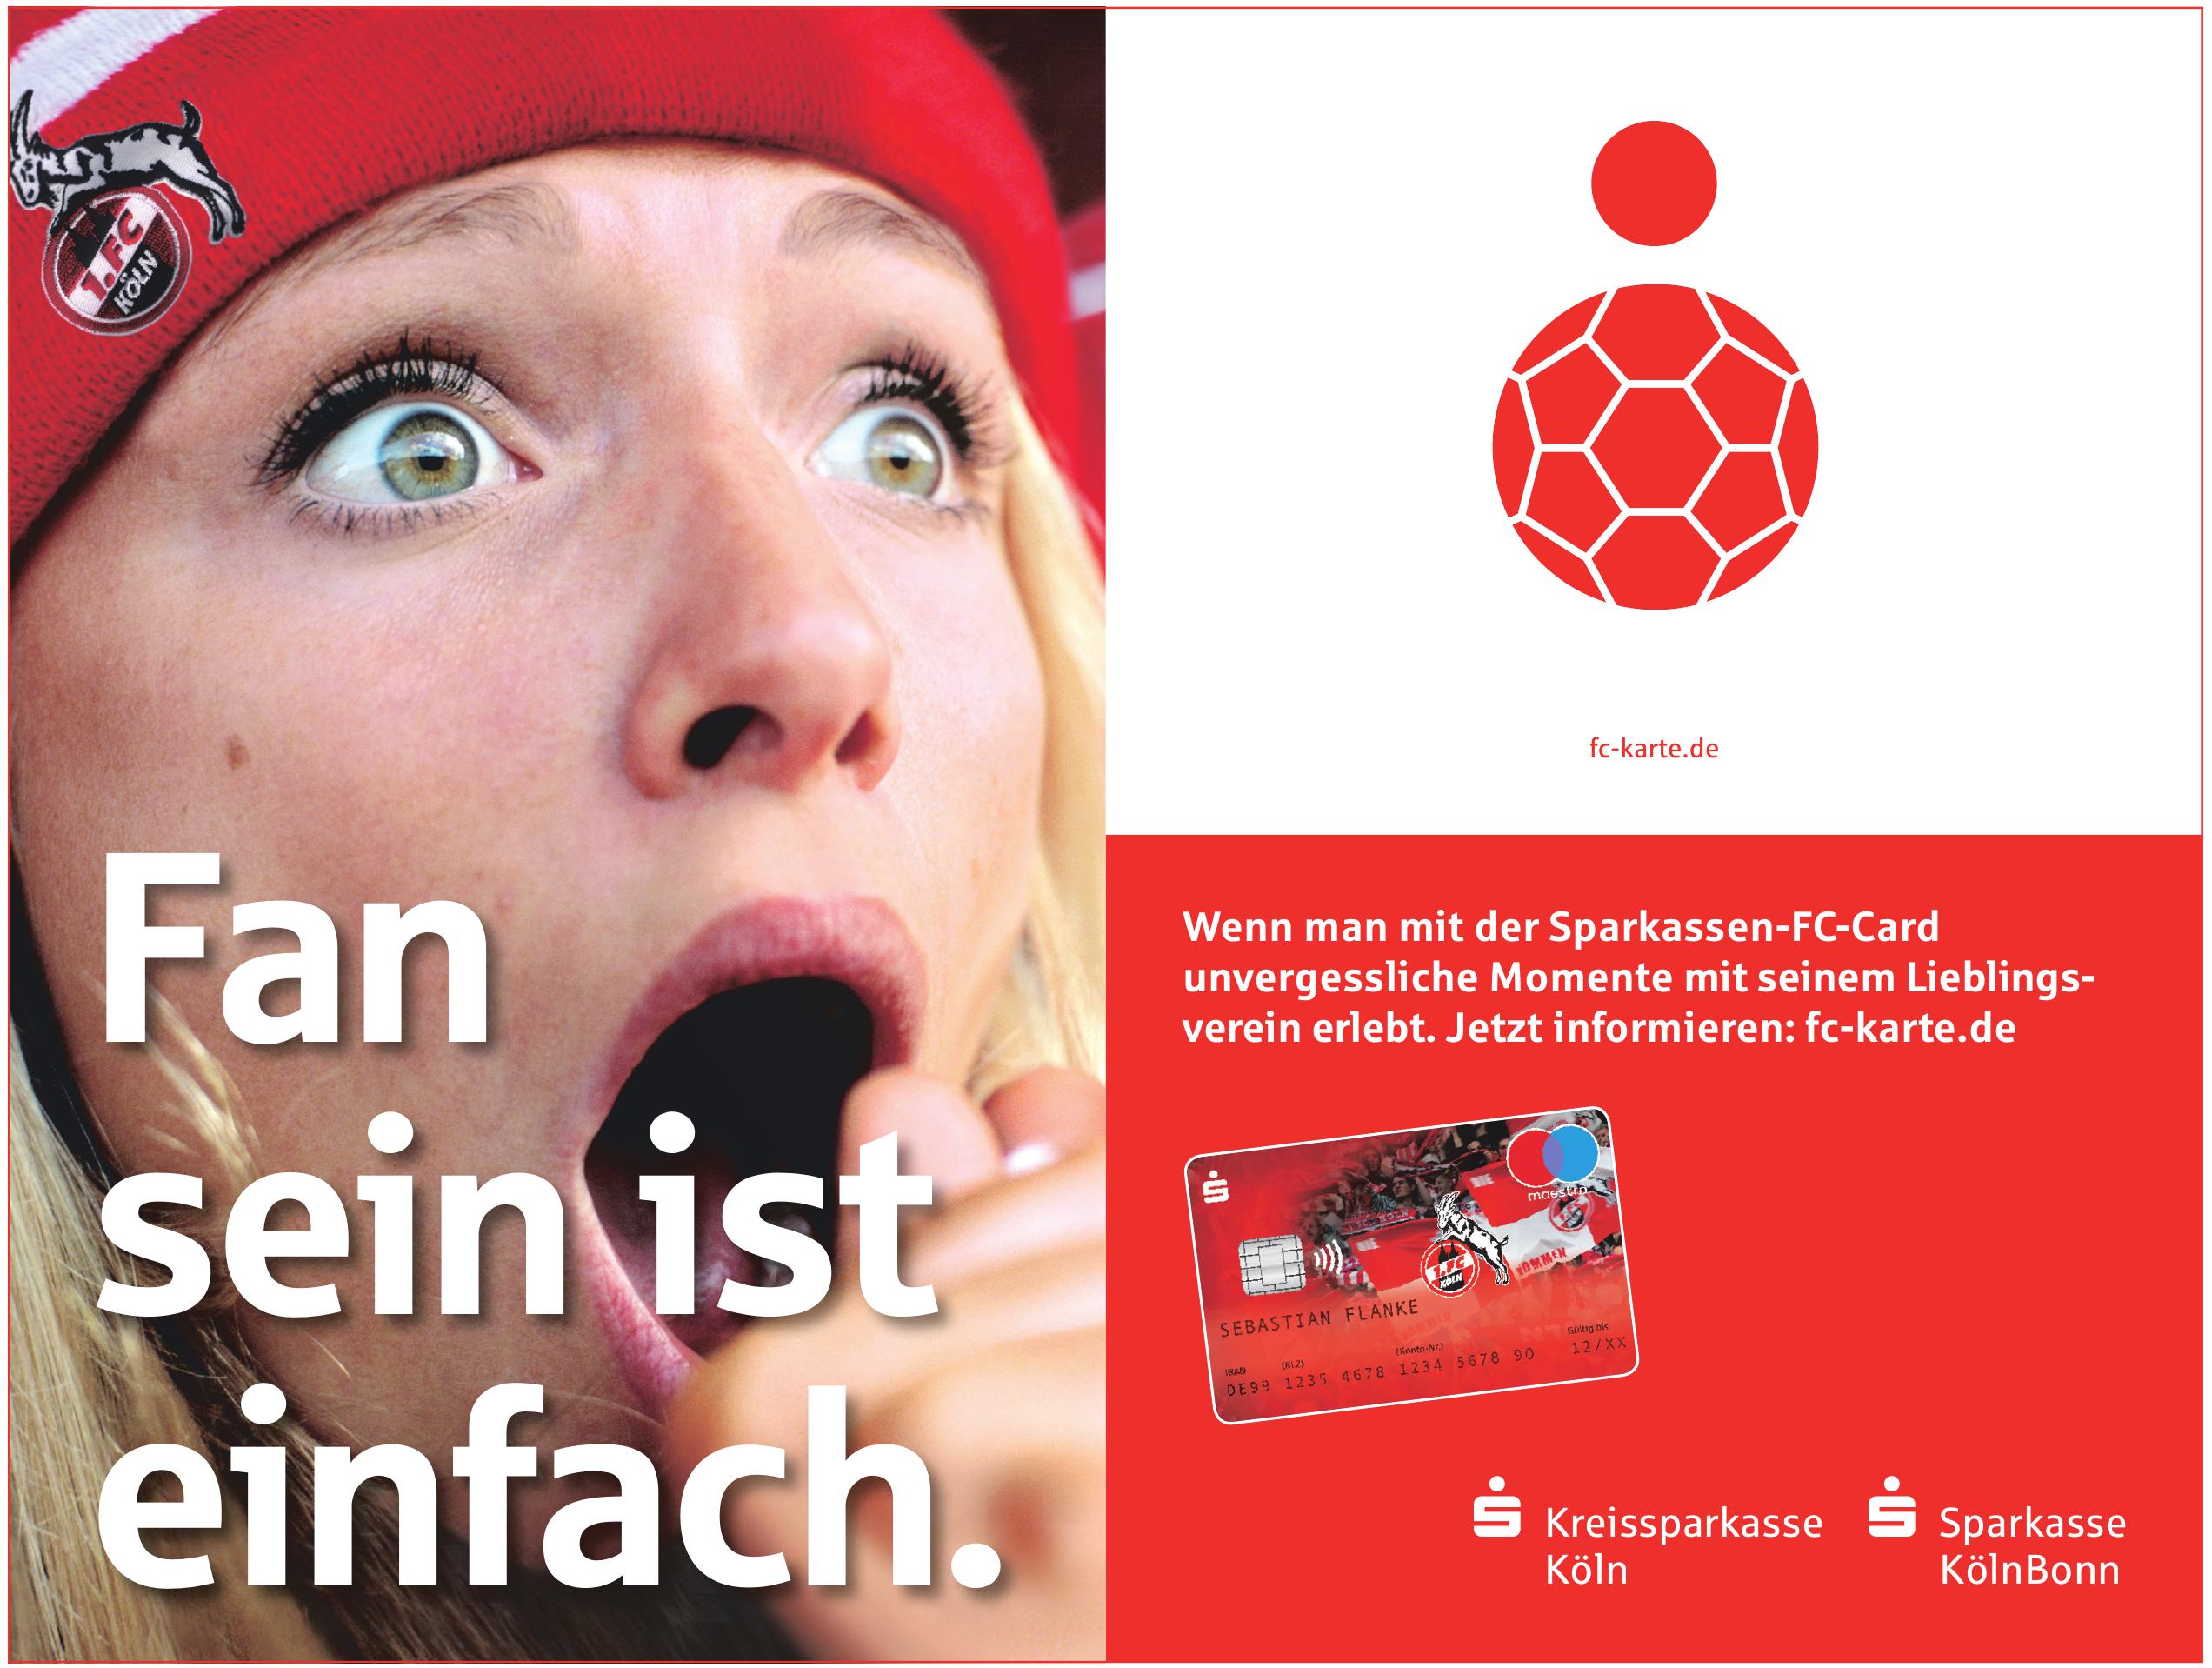 Sparkassen-FC-Card